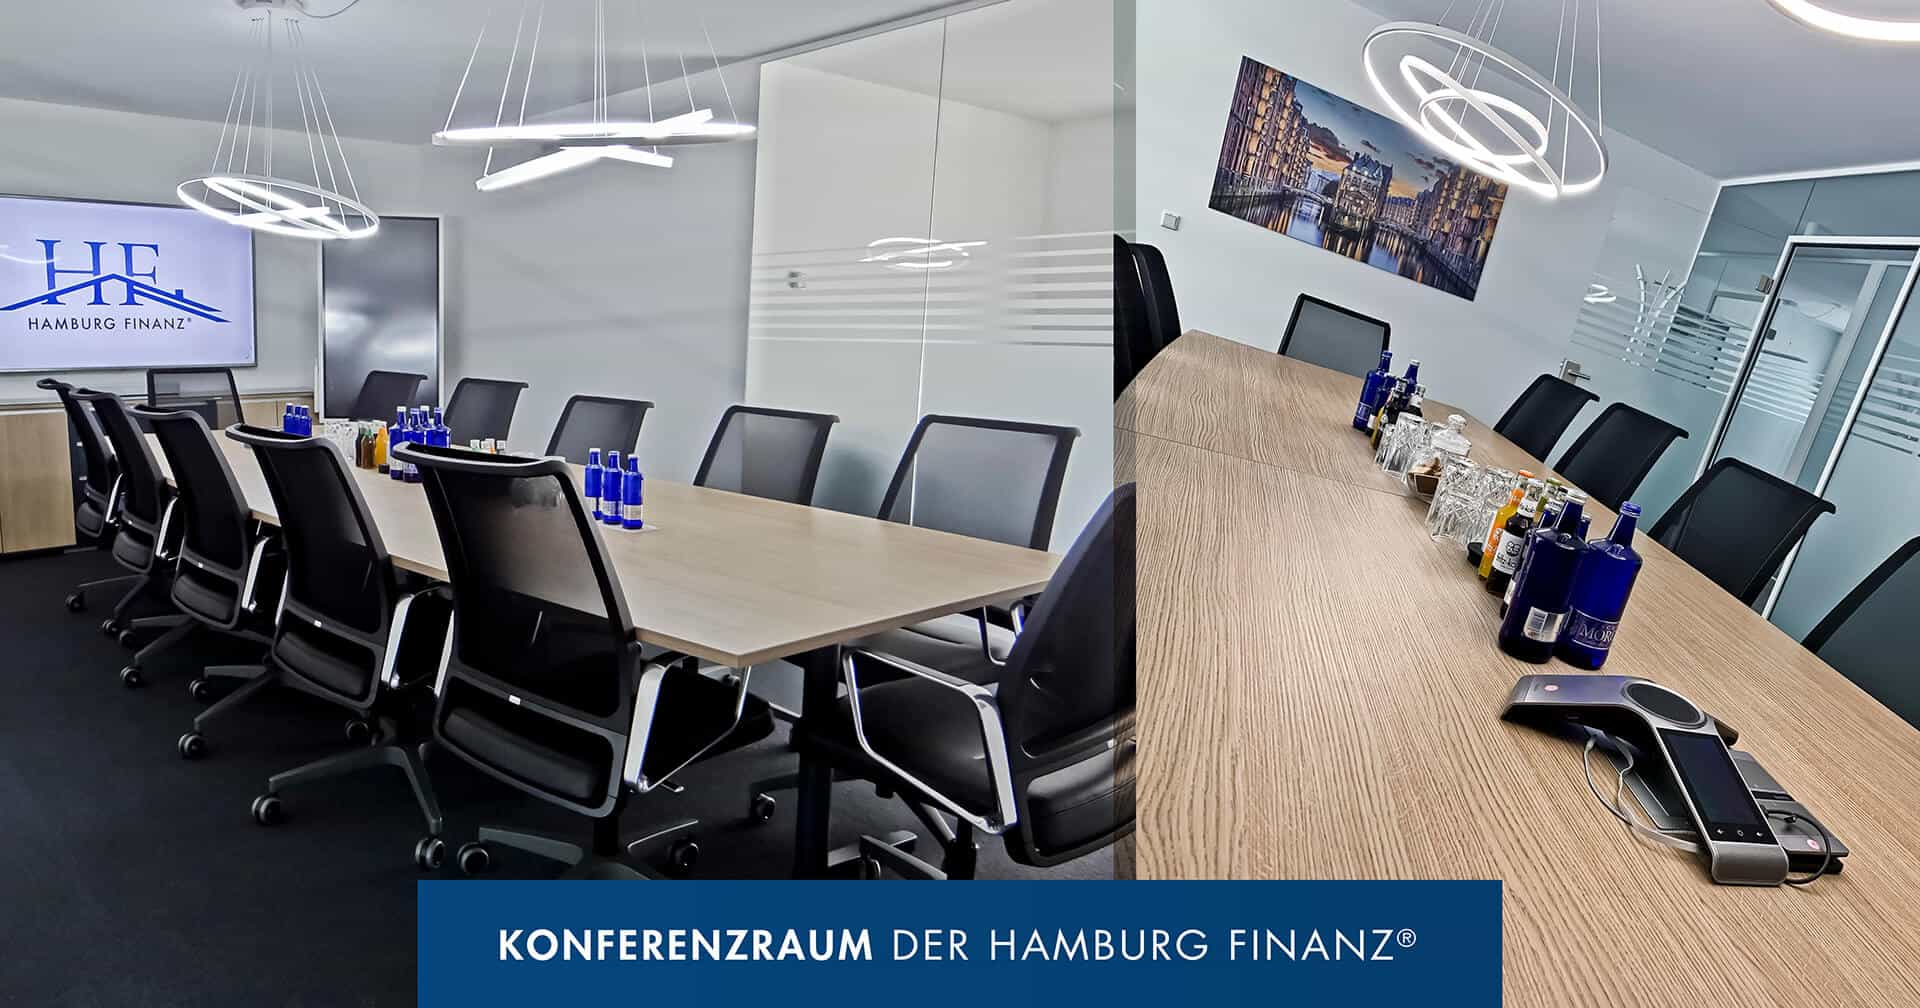 Büro der Hamburg Finanz